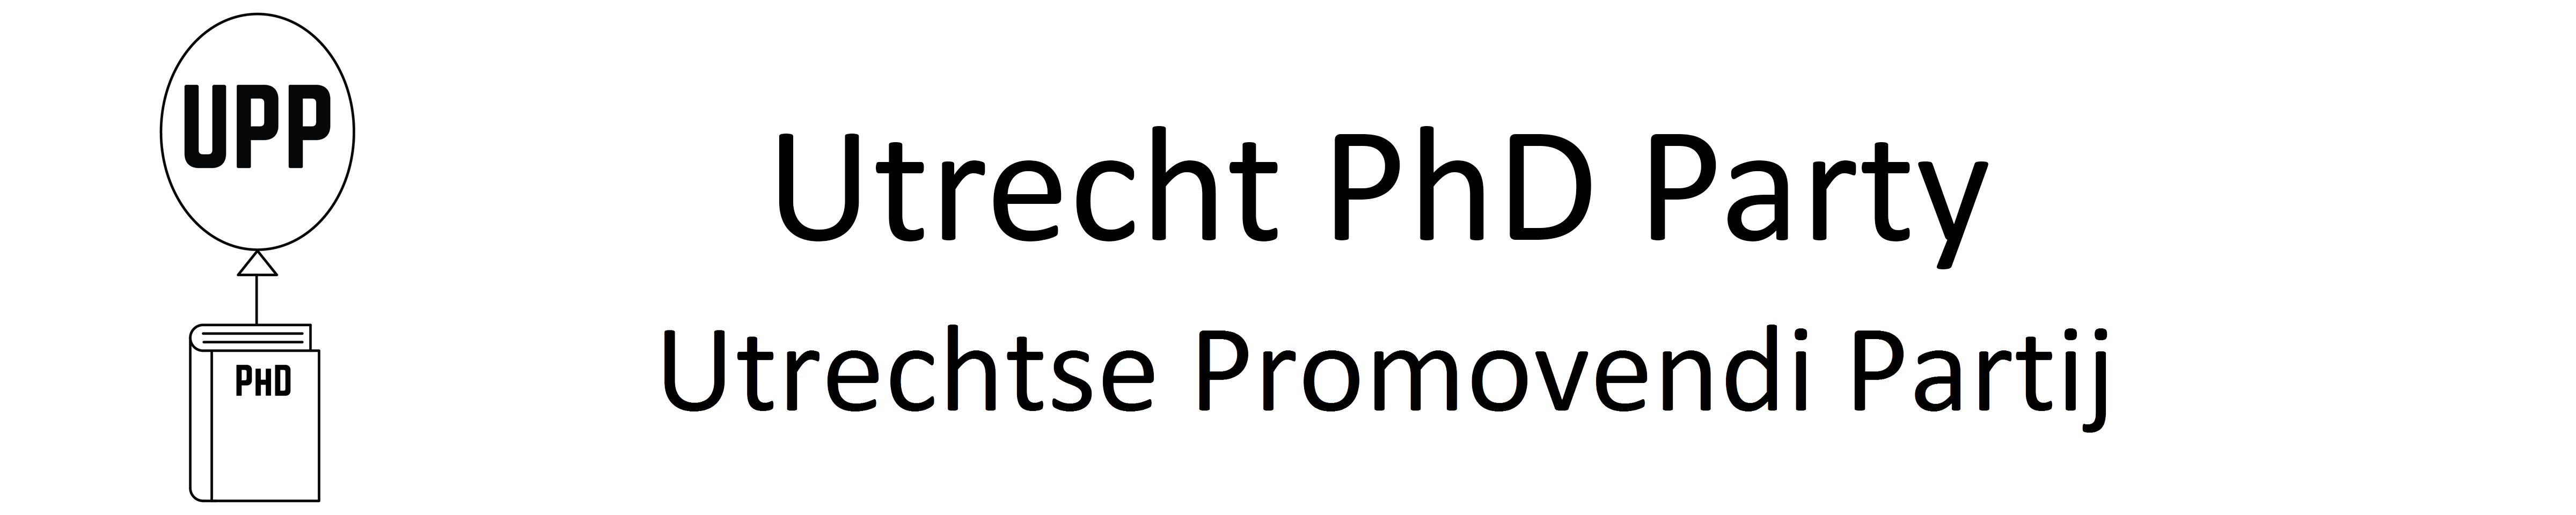 Utrechtse Promovendi Partij – UPP